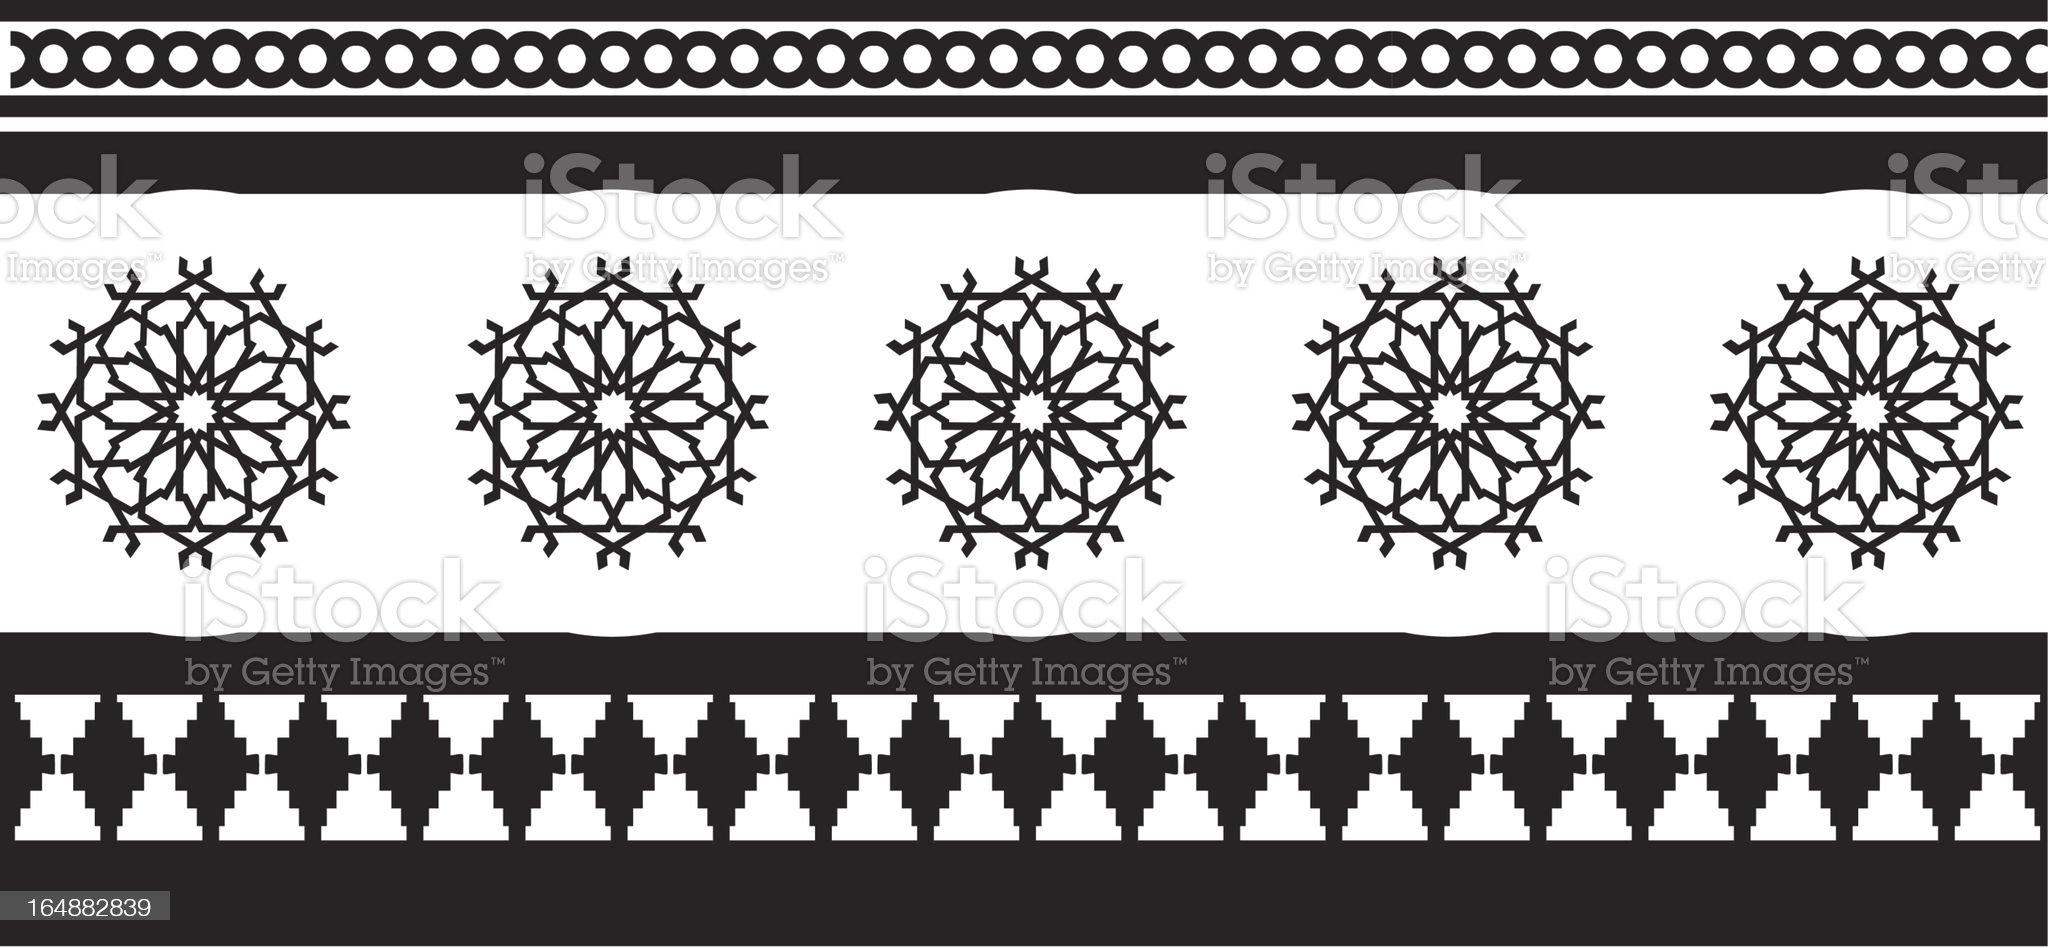 Moorish Styles 1 royalty-free stock vector art